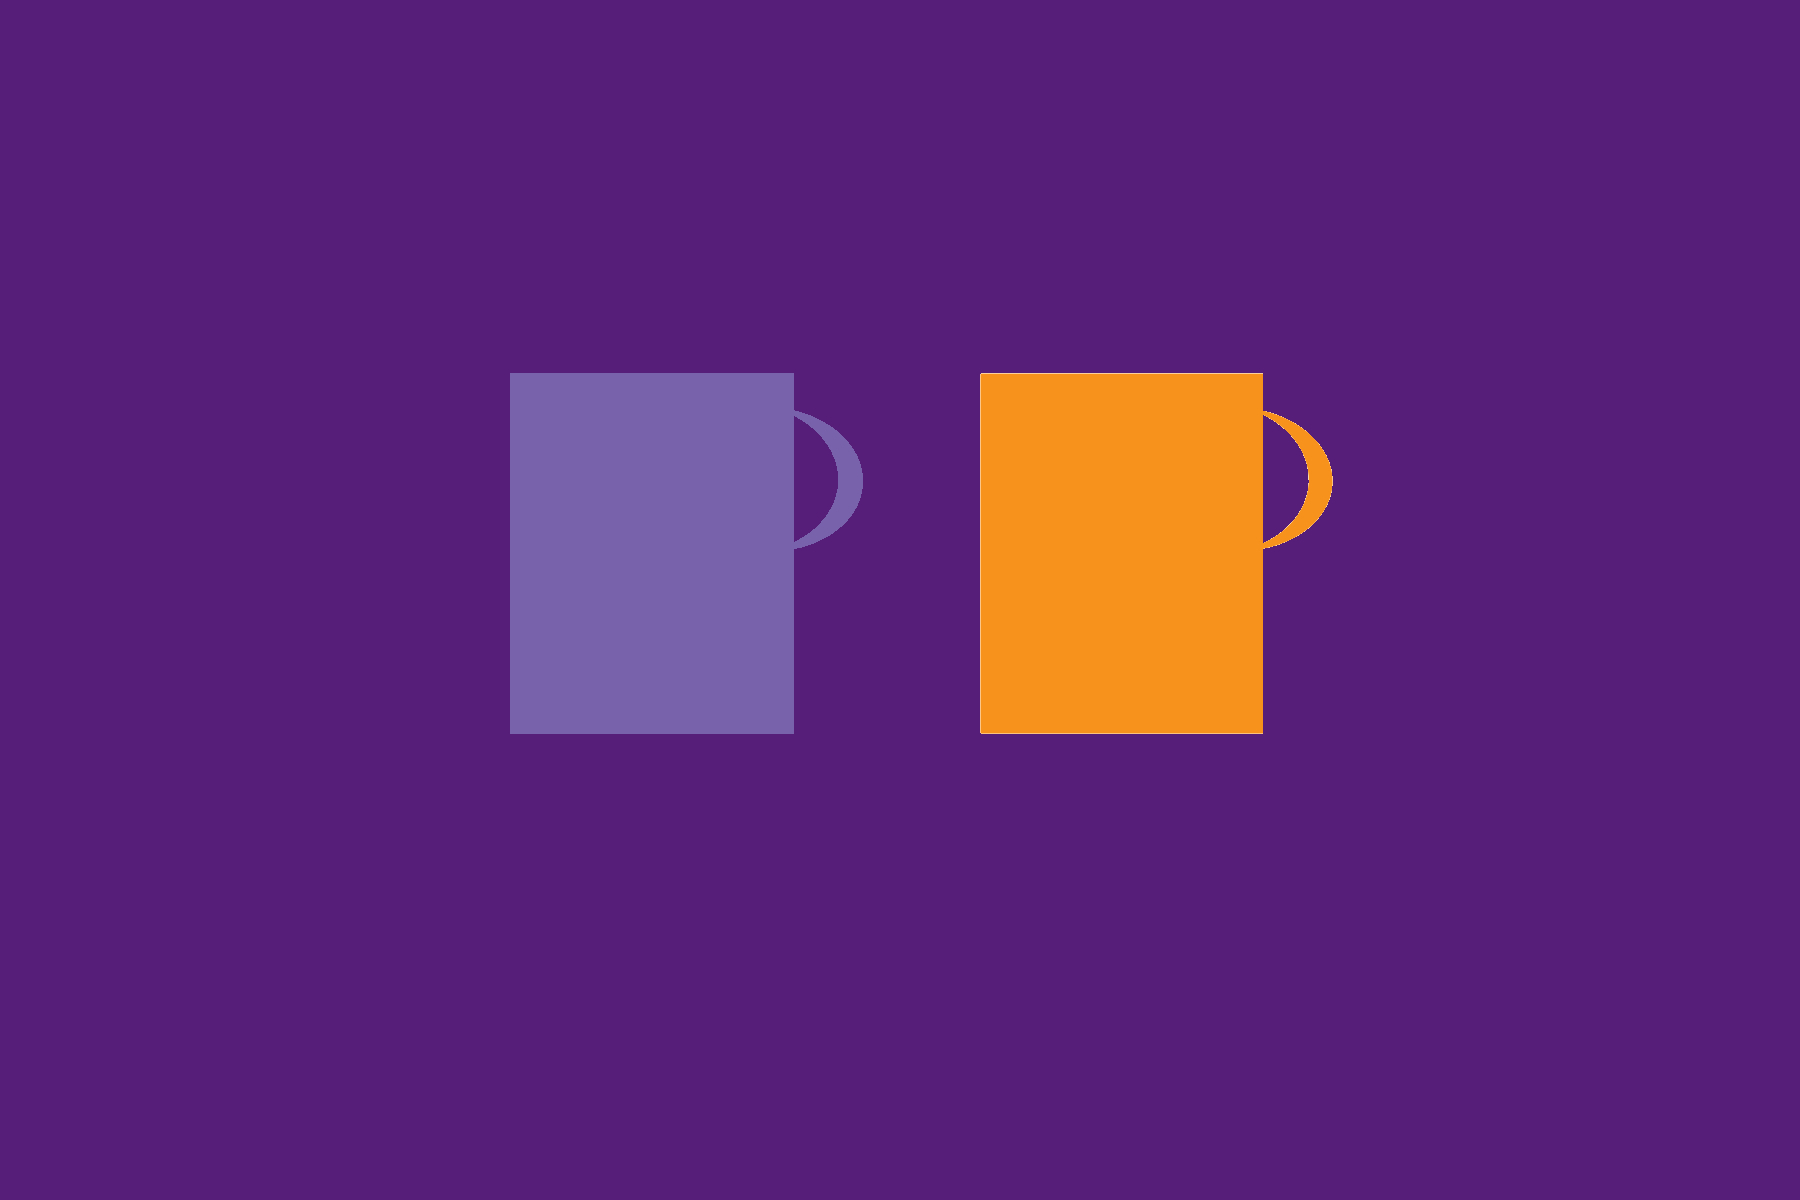 Digitaalisessa piirroksessa kaksi kahvimukia violetilla pohjalla.